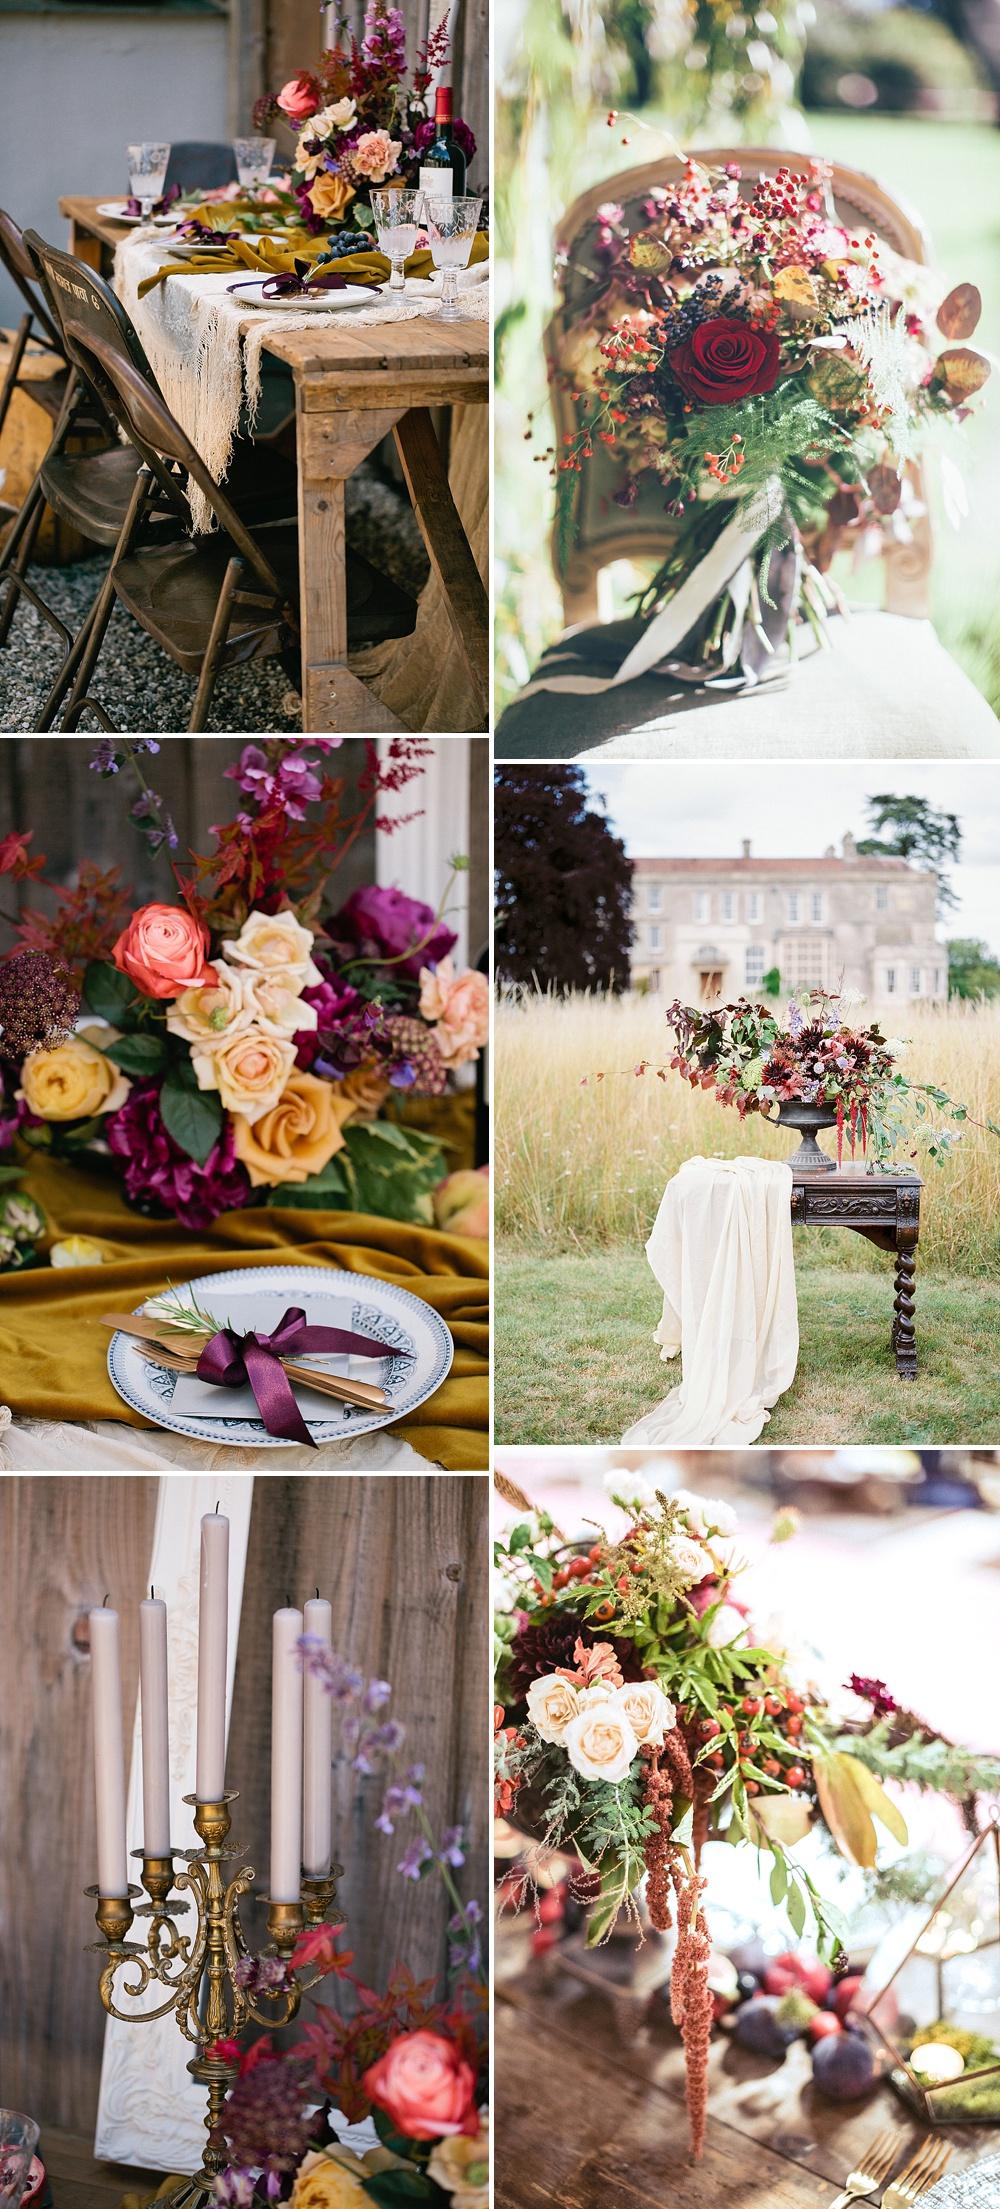 Rich Berry Tones // Autumn Wedding Styling